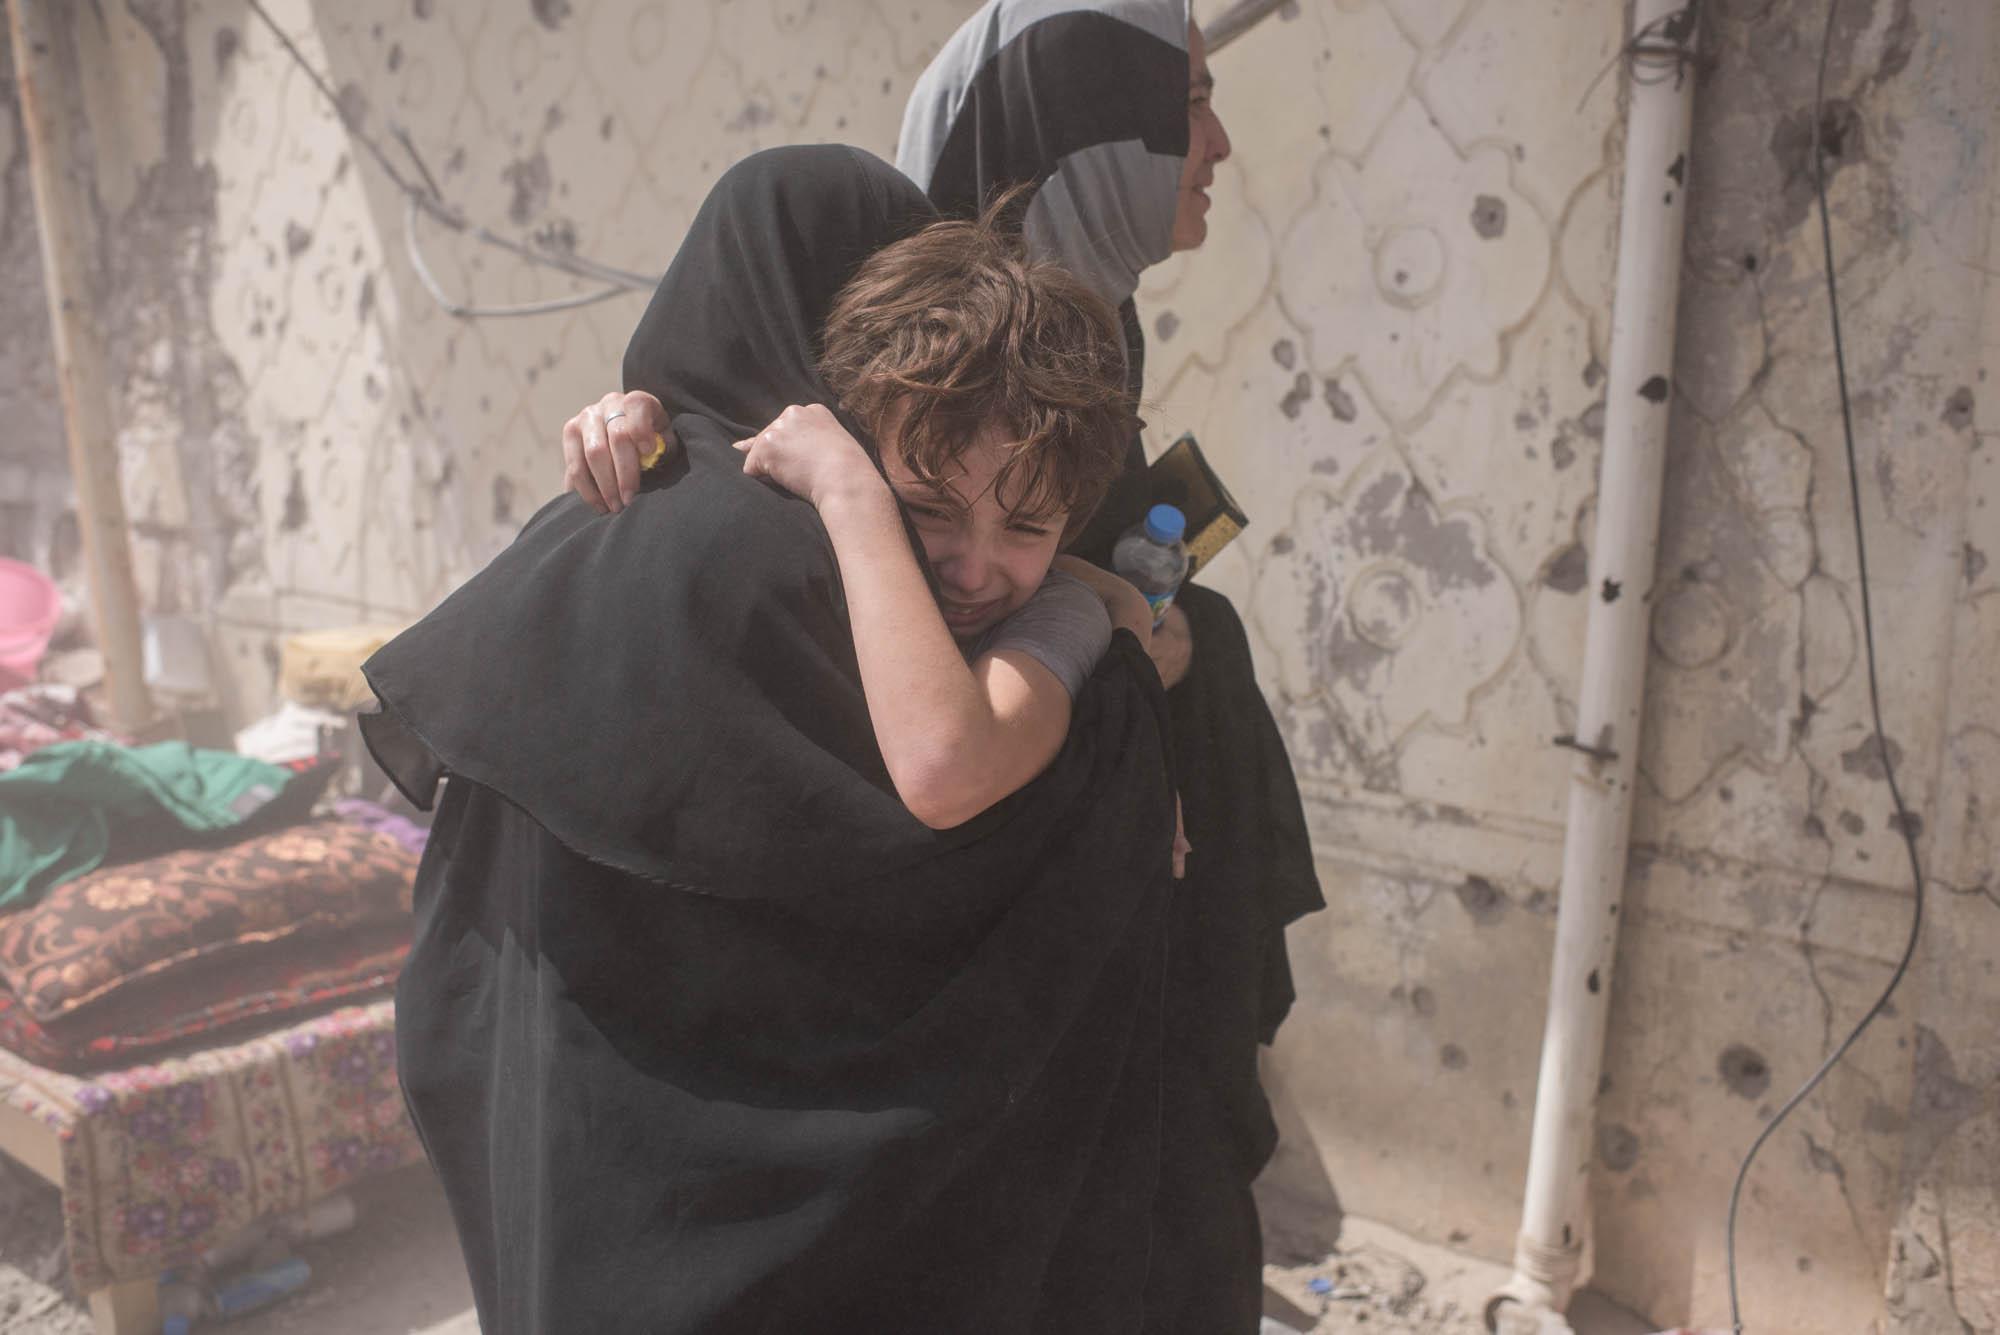 (© UNHCR/Cengiz Yar)